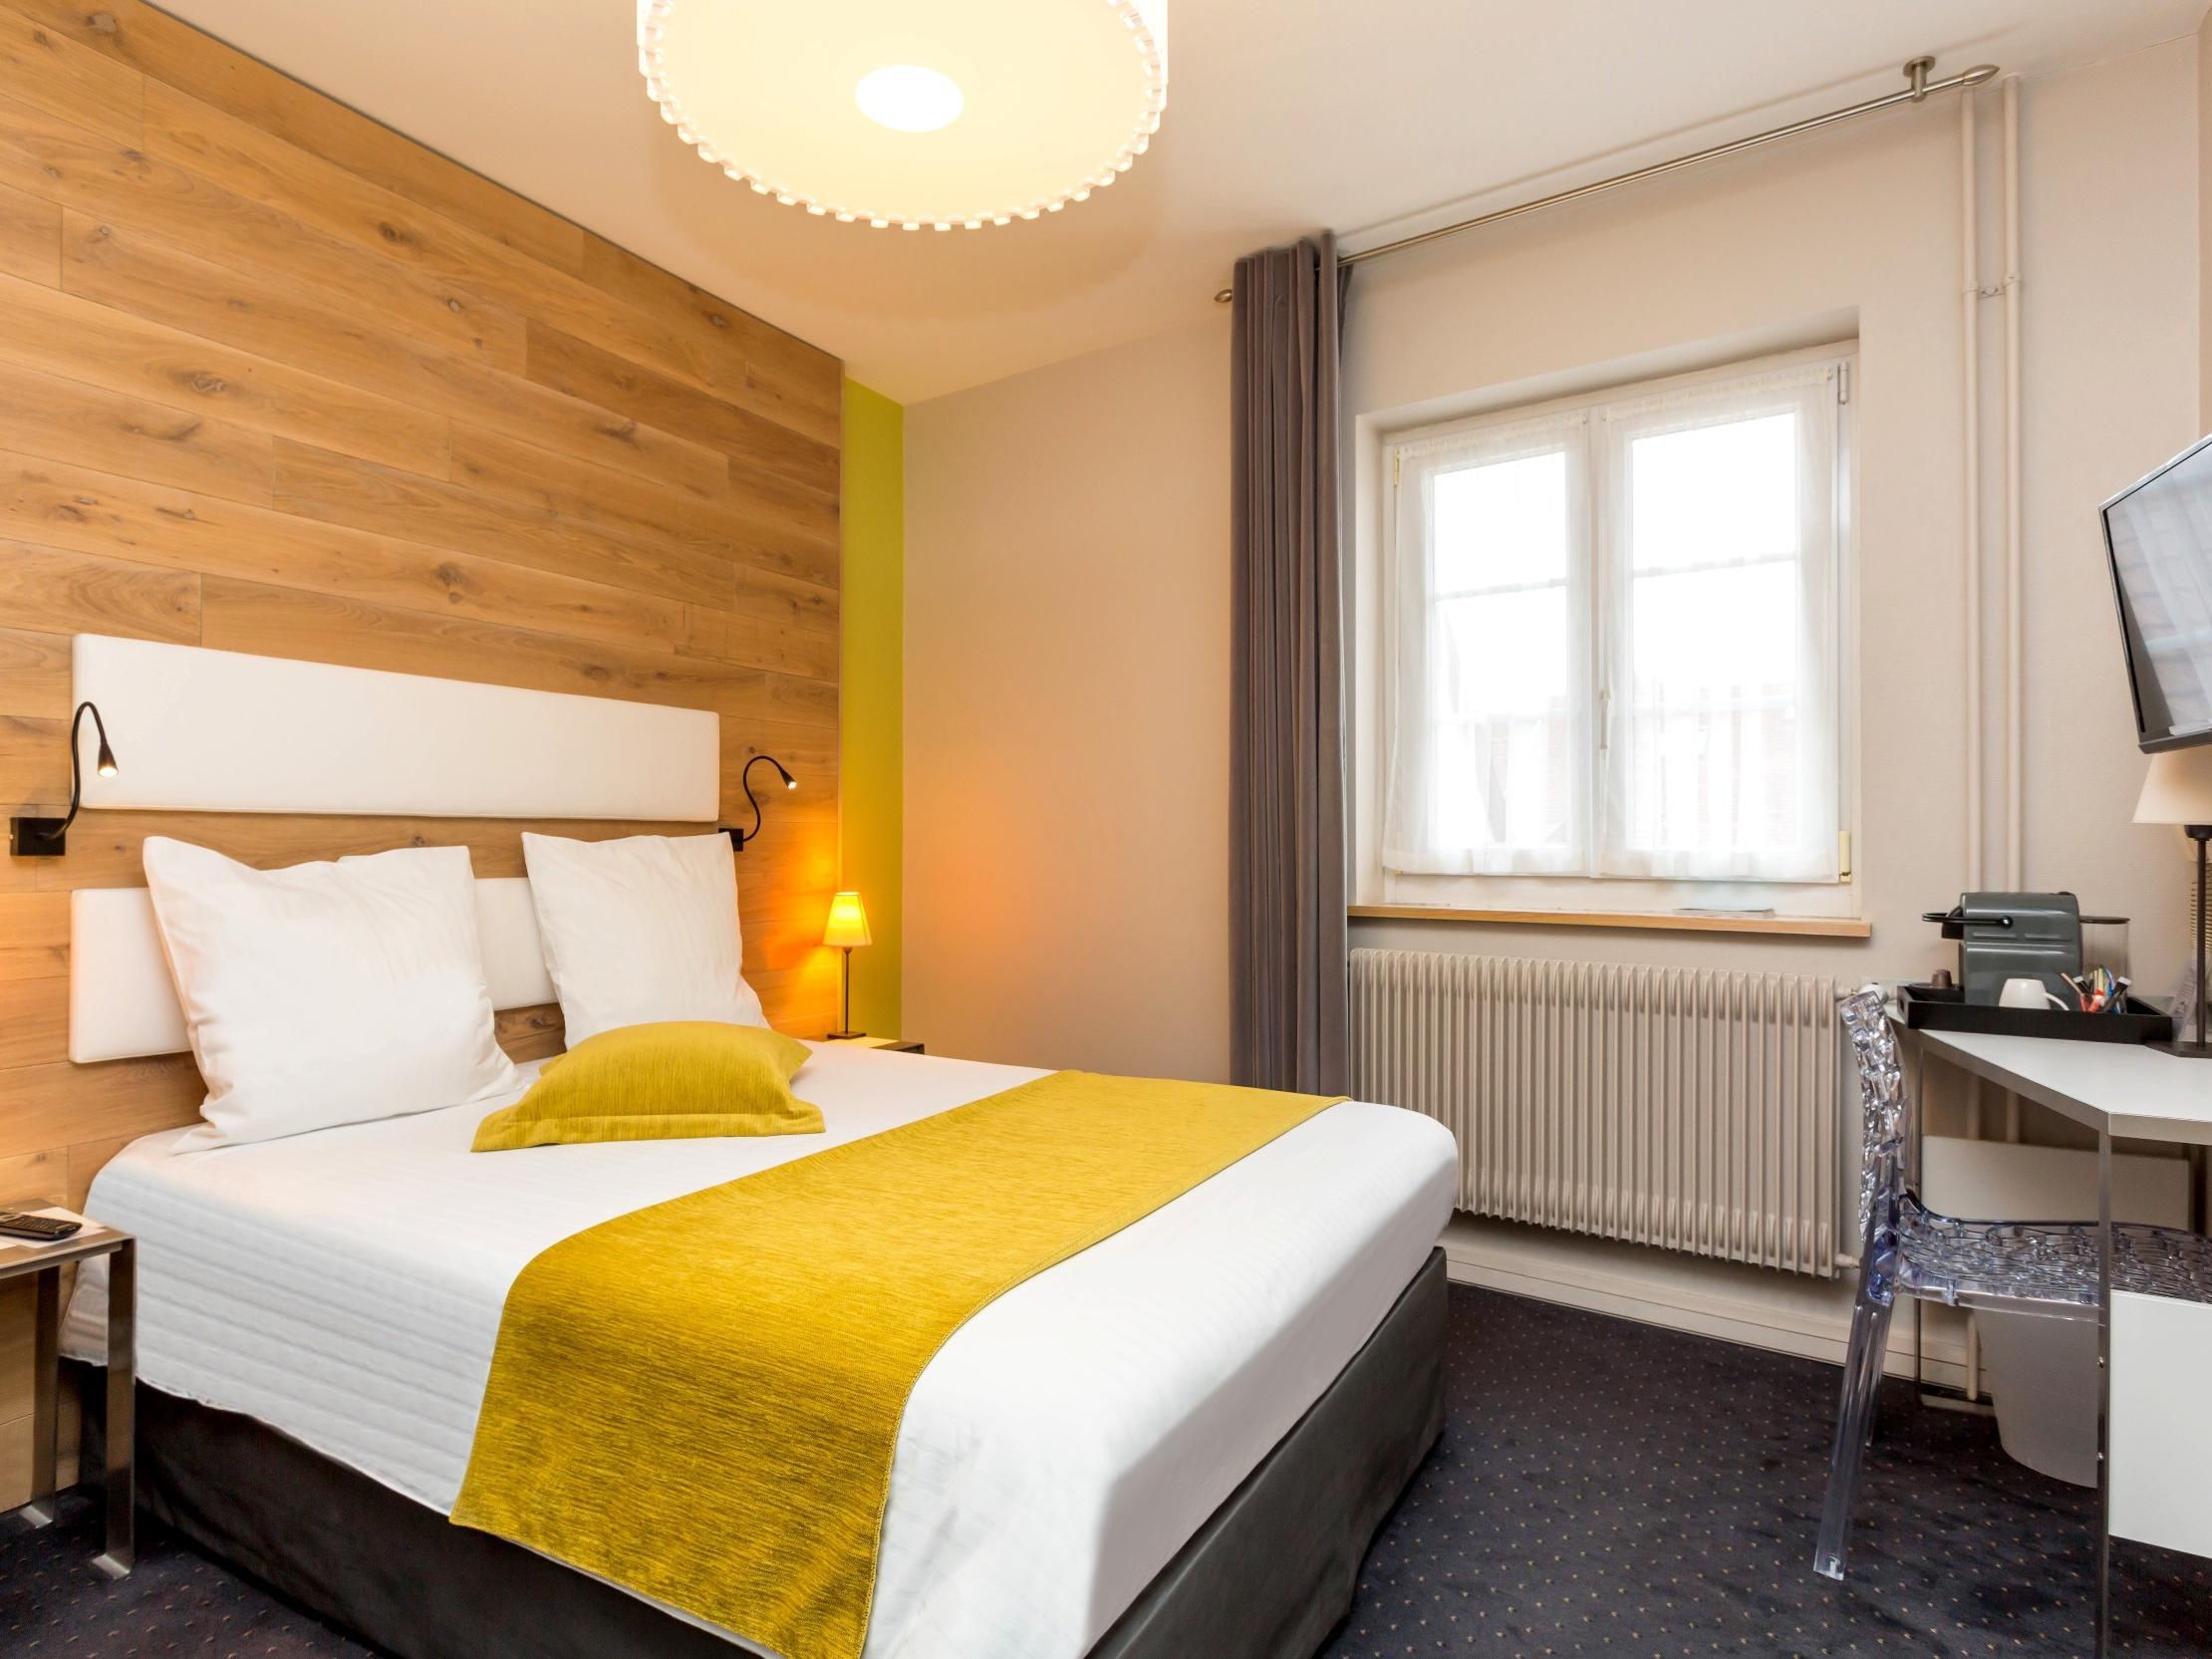 Auberge Meuniere Thannenkirch dedans pilgo - liste des hôtels